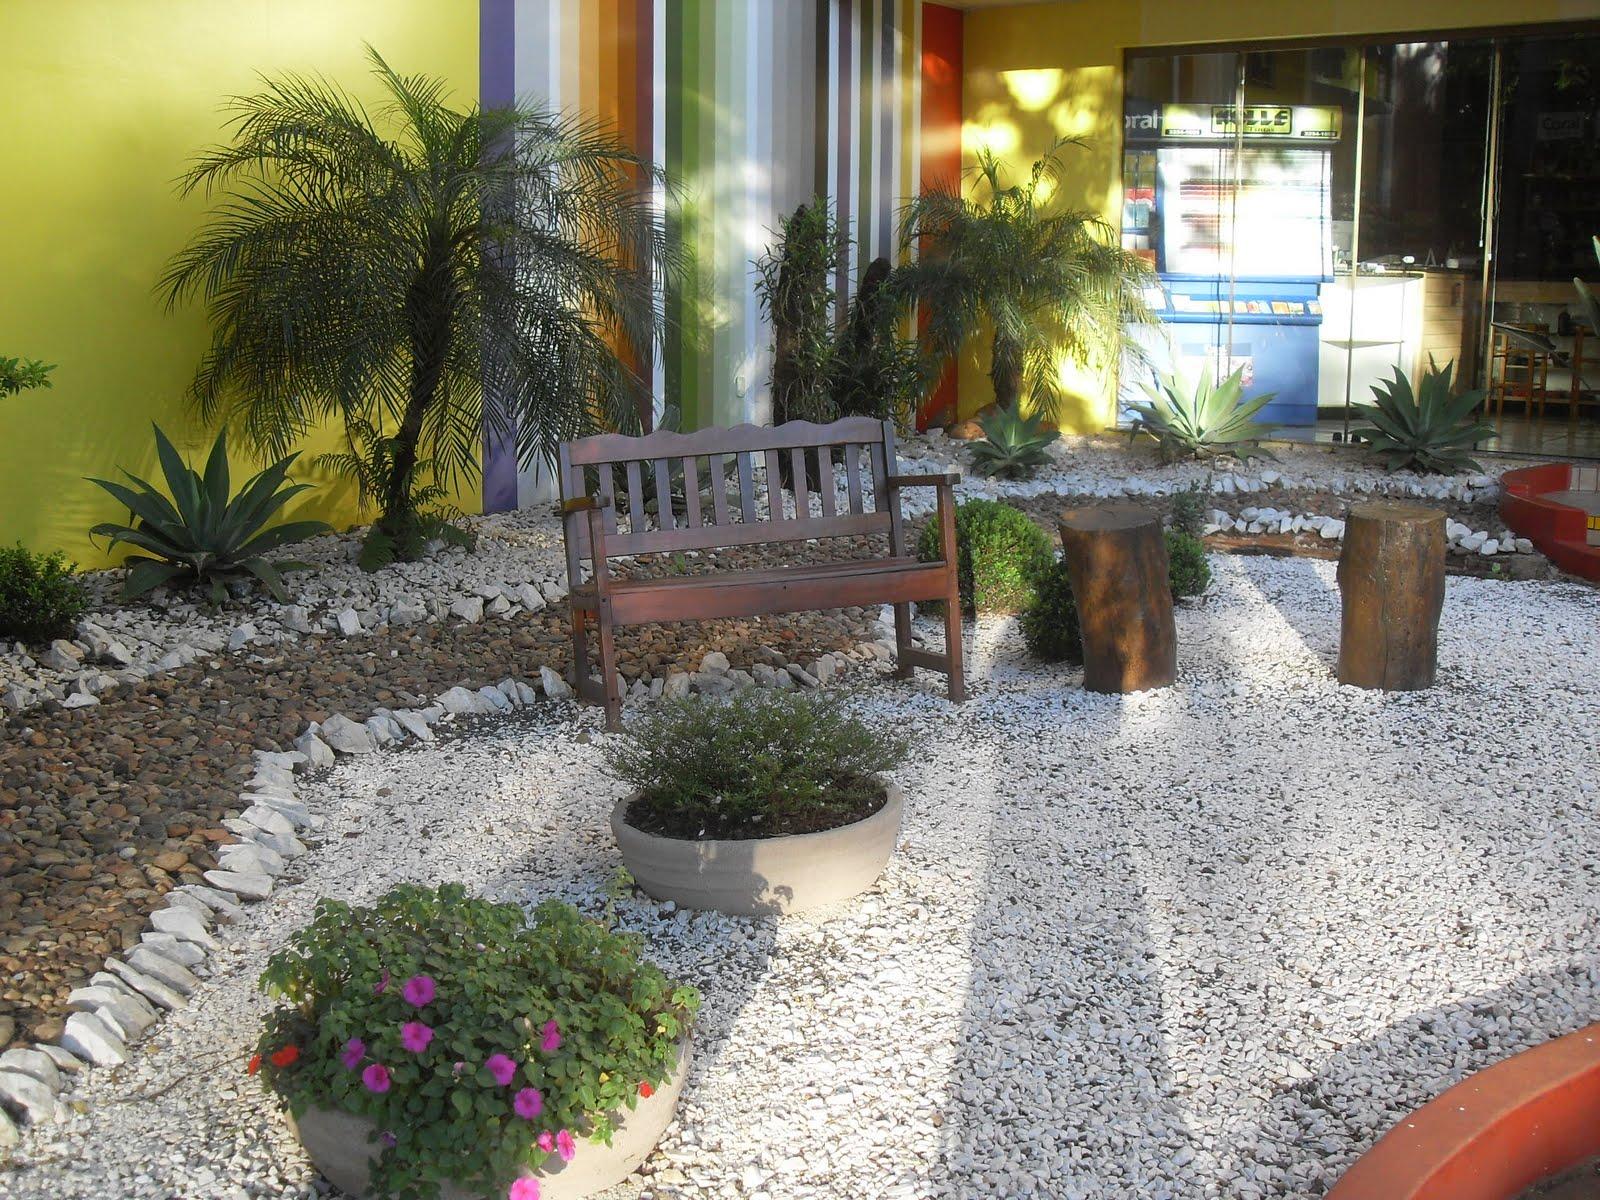 Favoritos Ricardo Suptitz Paisagismo: Jardins das Pedras NU66